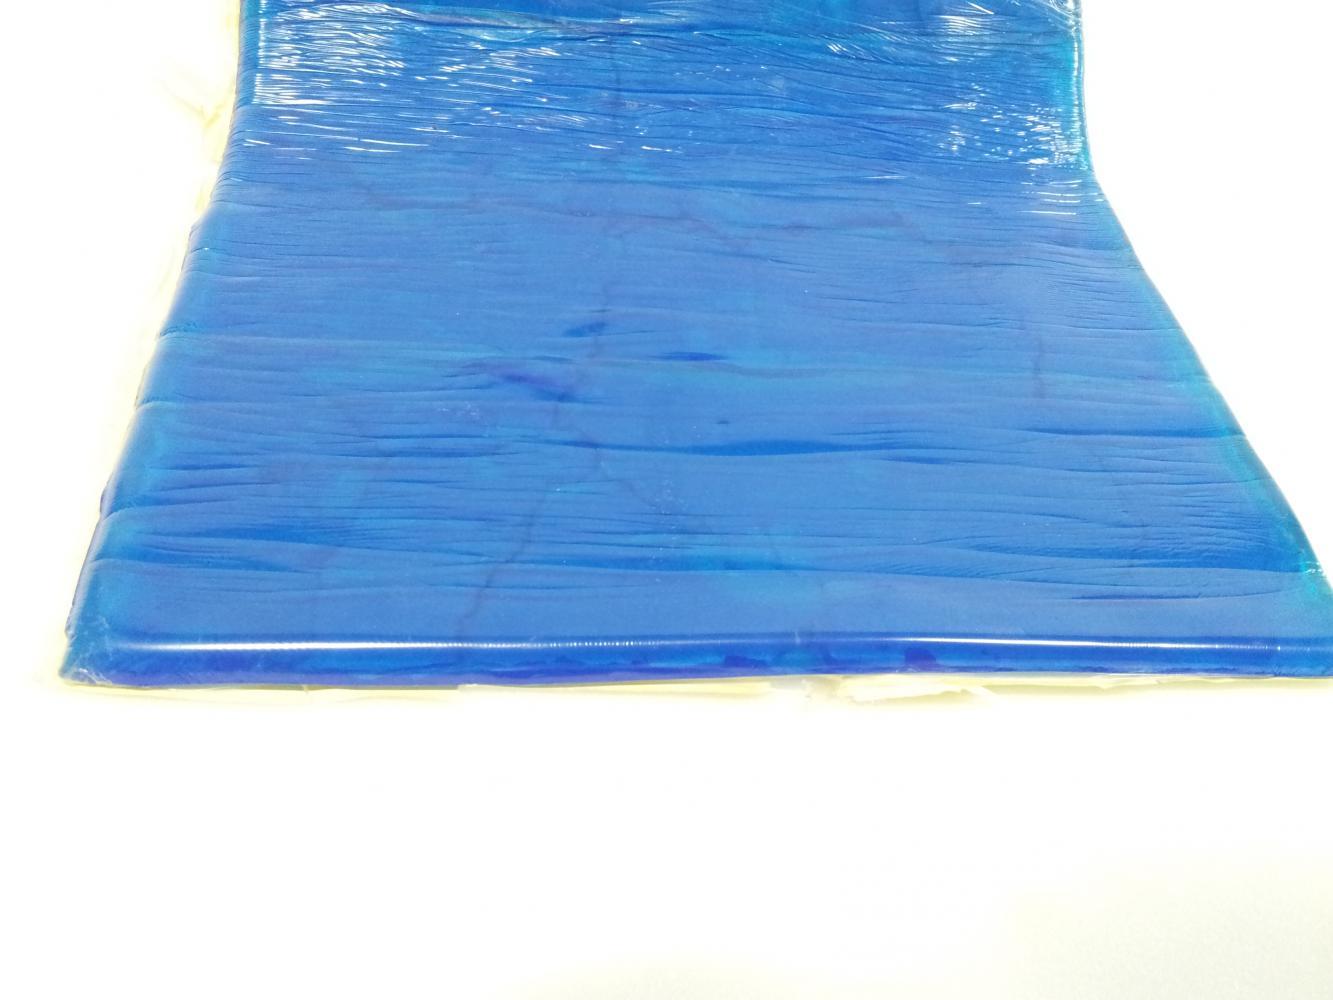 insertion de gel pad coussin de gel visco lastique dans. Black Bedroom Furniture Sets. Home Design Ideas